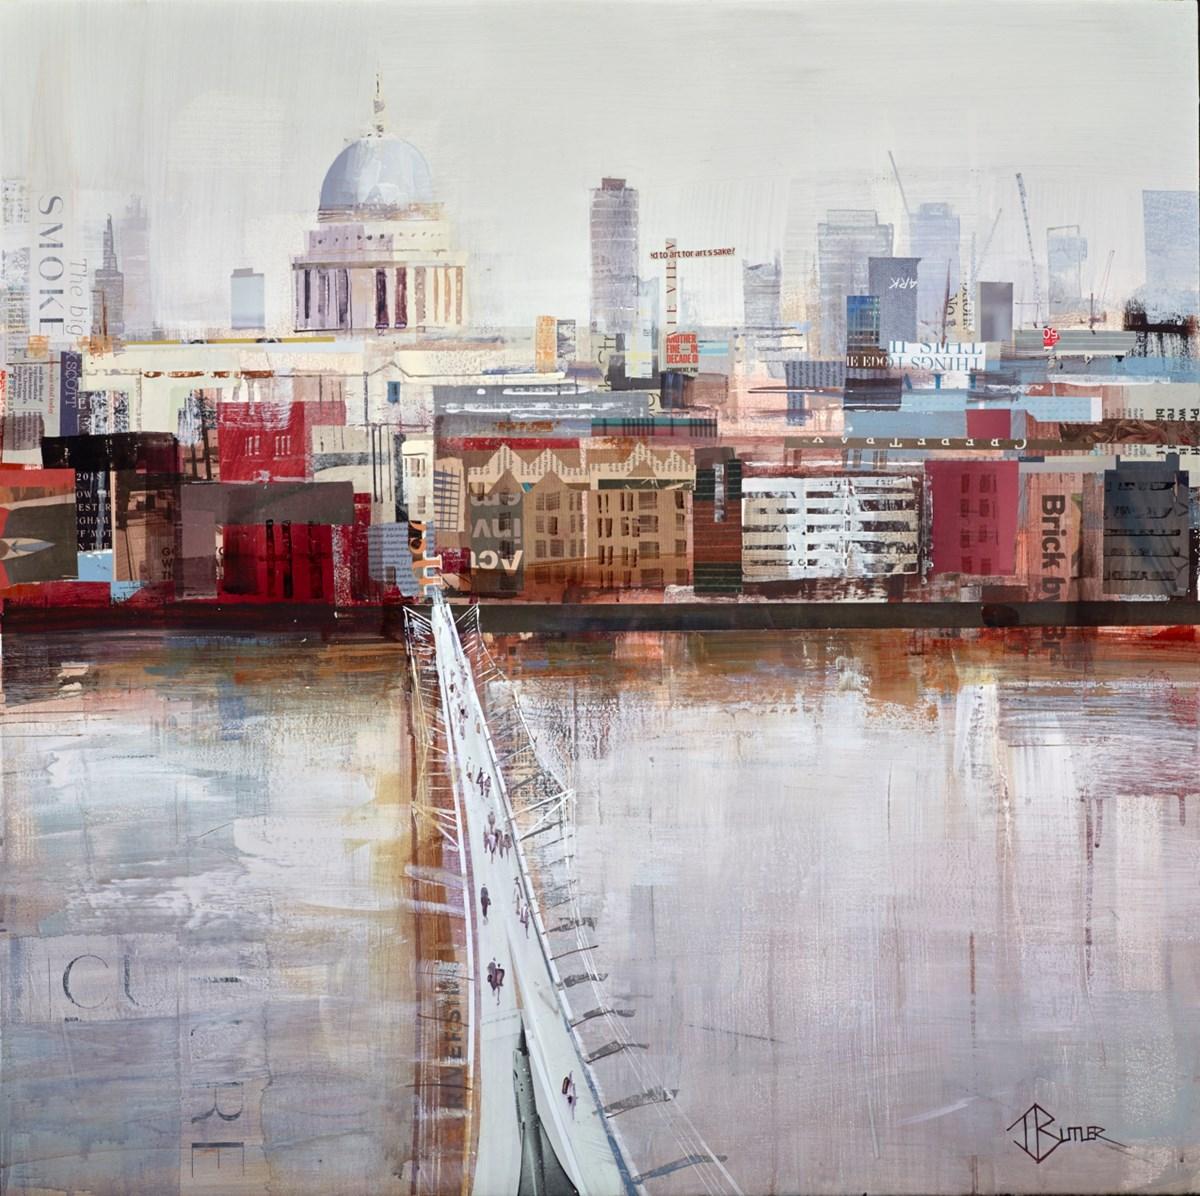 Tate View